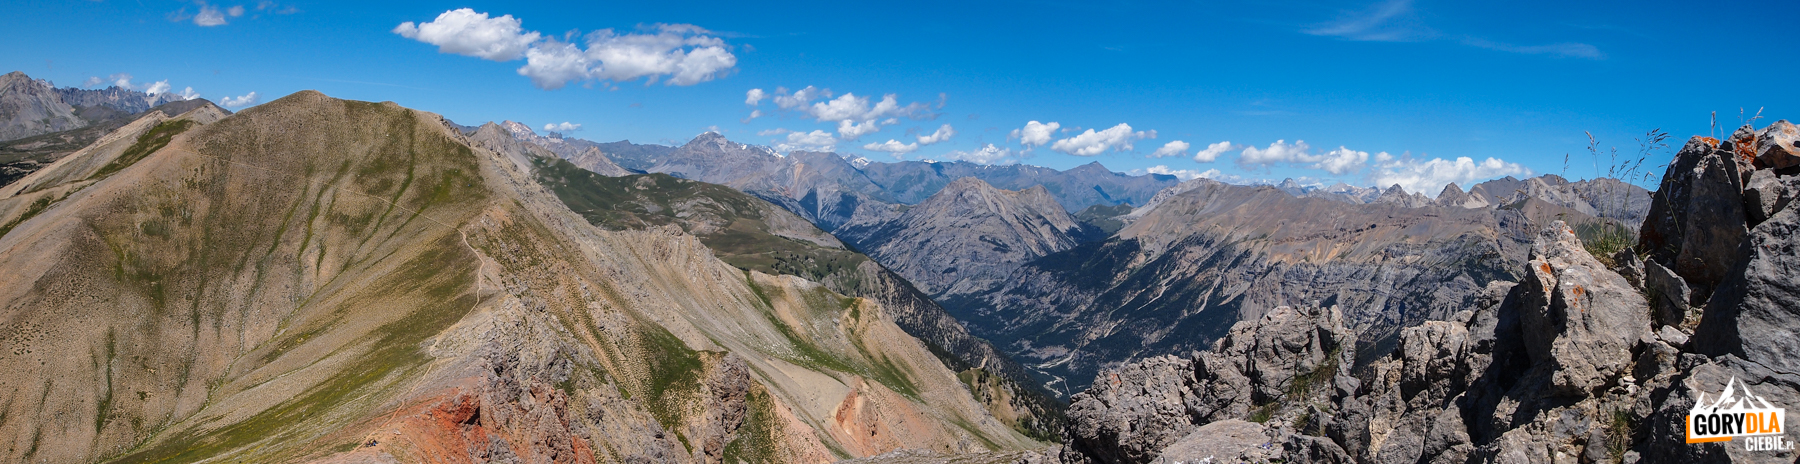 Panorama z grani pod szczytem Petite Peyrolle (2618 m)